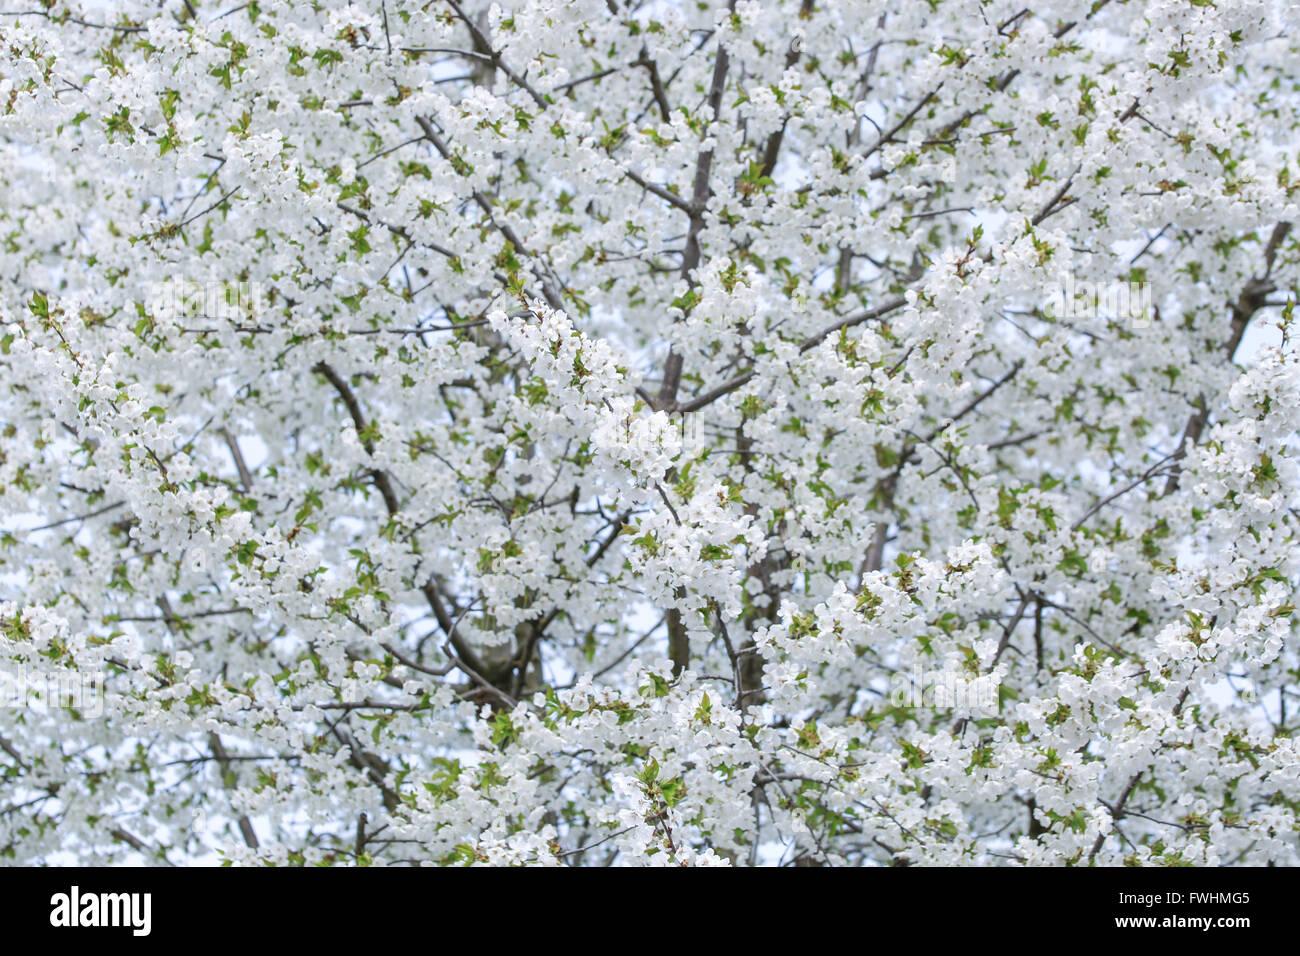 White cherry flowers - Stock Image